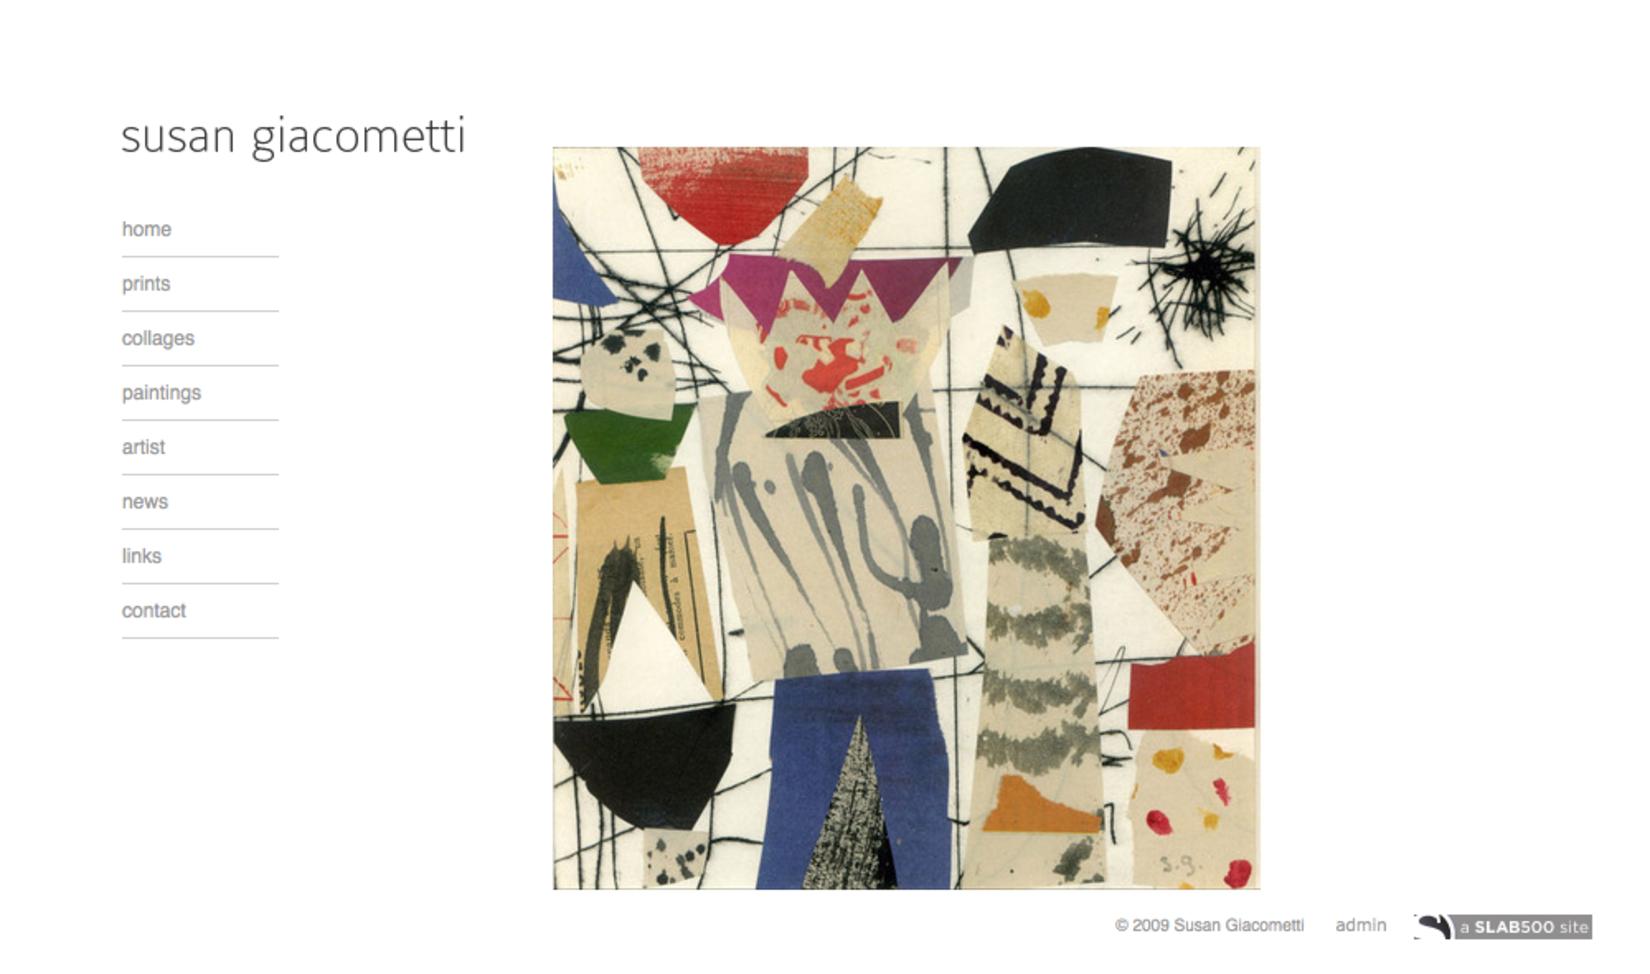 Susan Giacometti, PrintmakerPainter